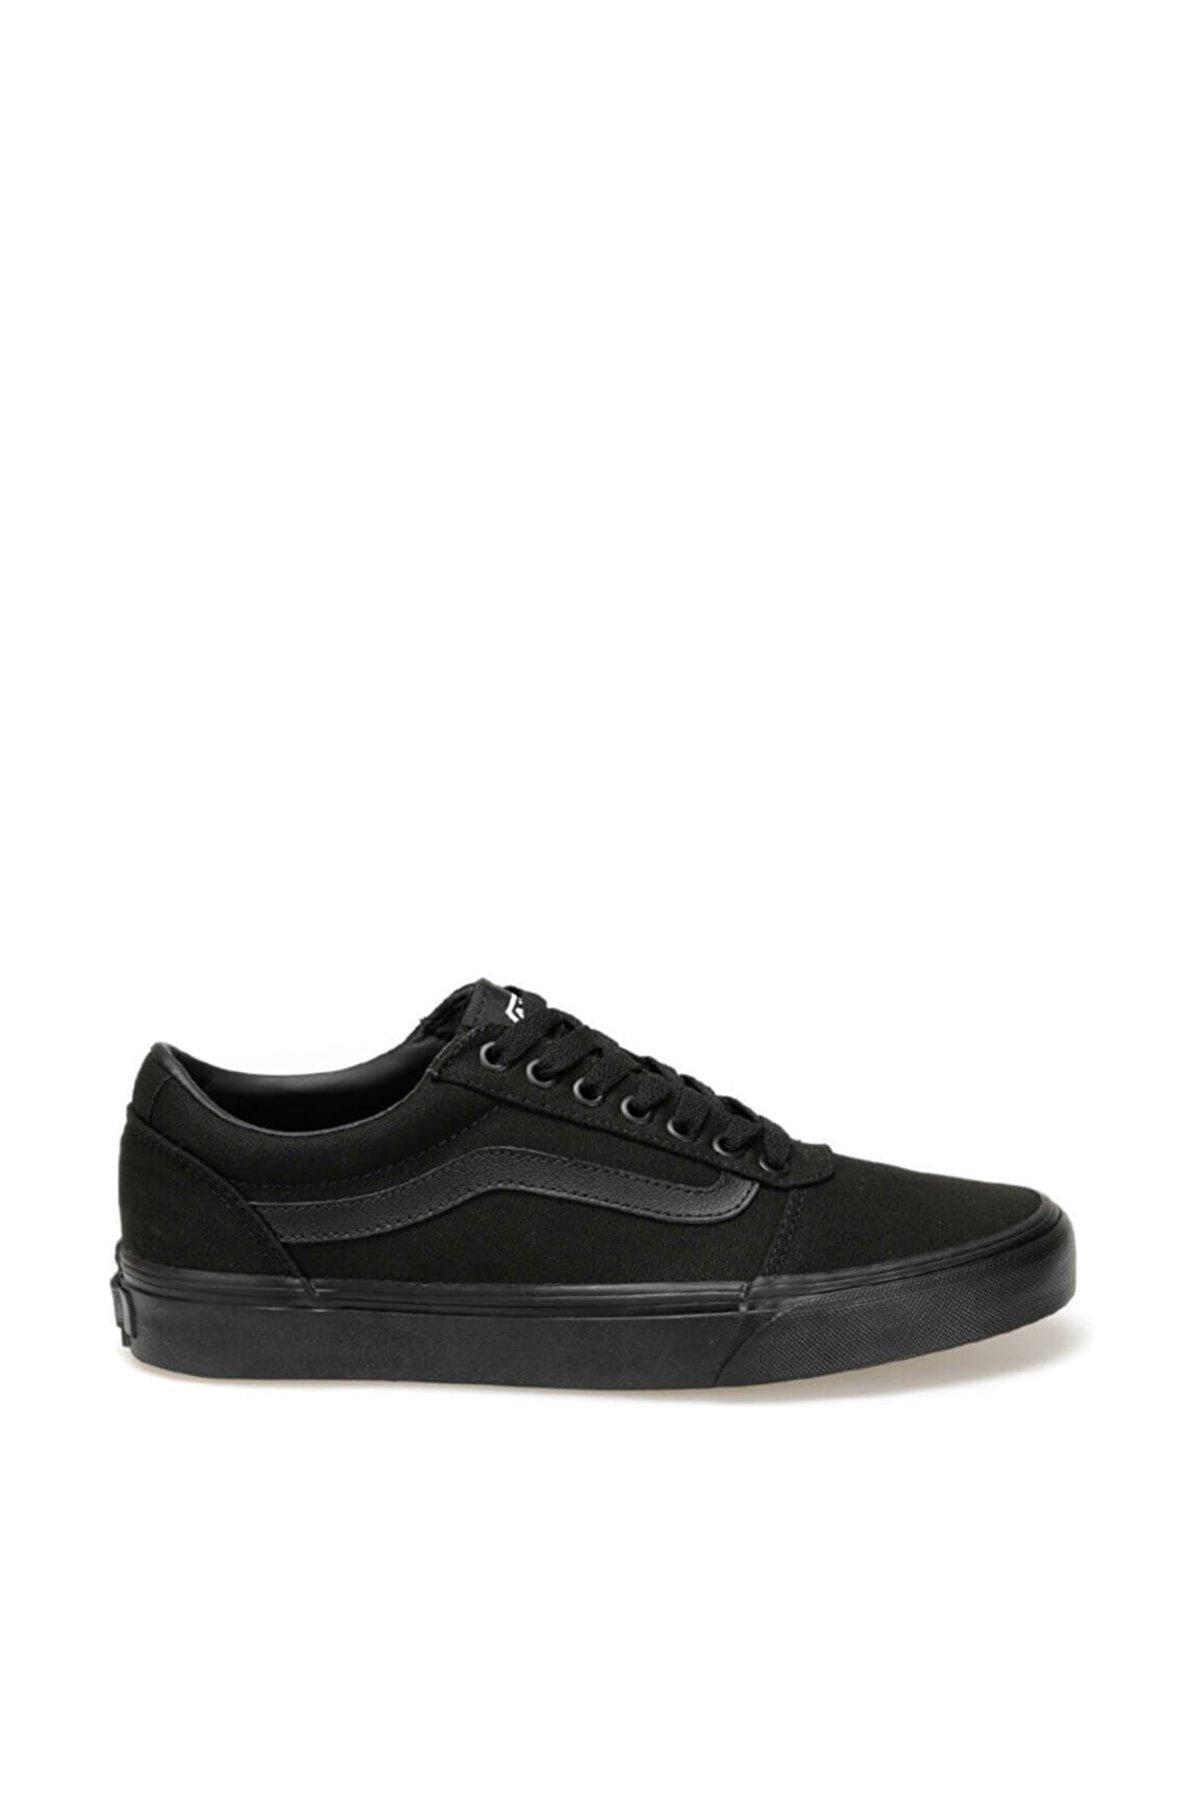 Vans MN WARD Siyah Erkek Sneaker Ayakkabı 100445019